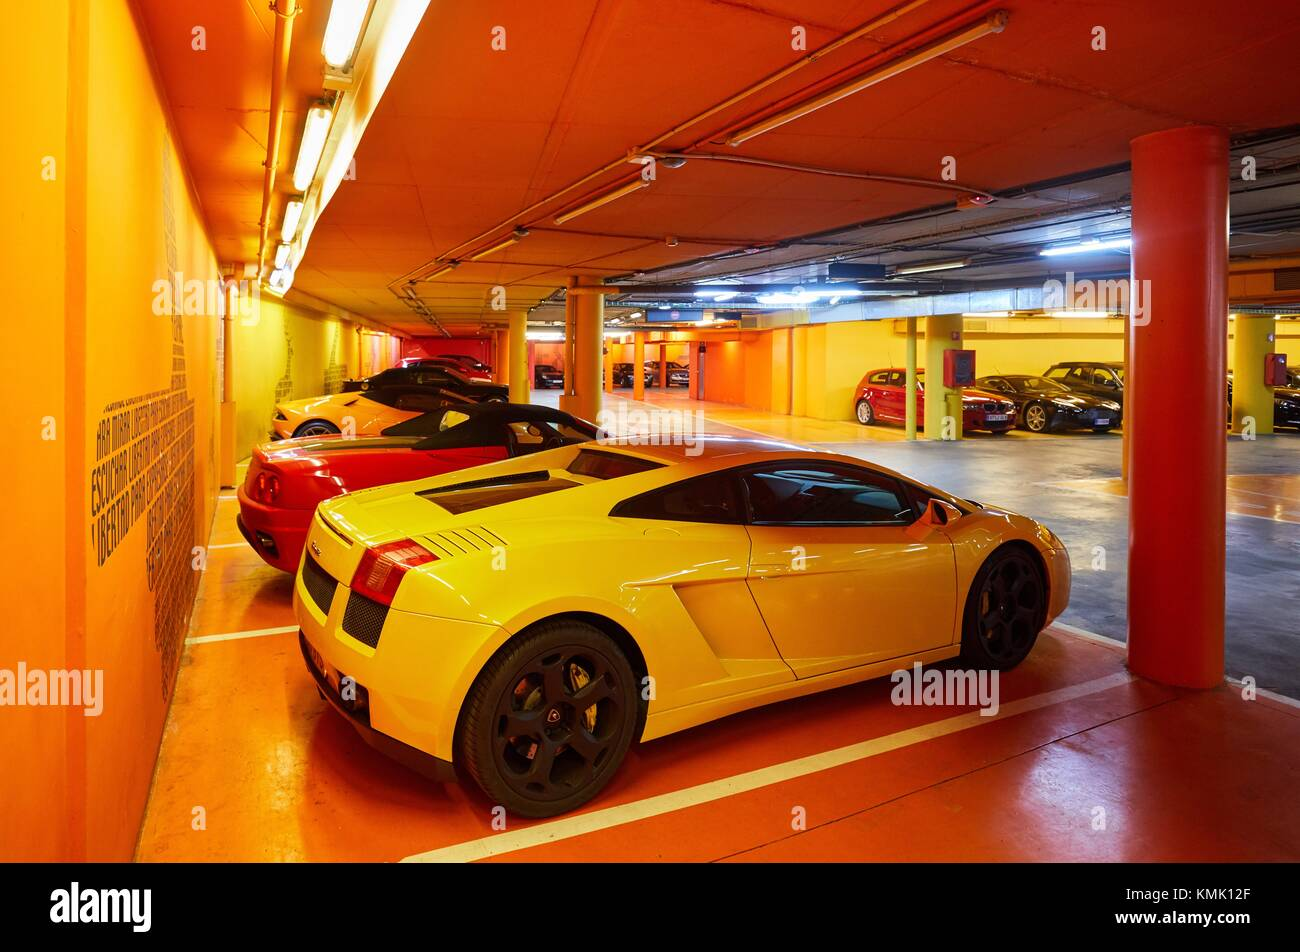 Sports cars, garage, Hotel Puerta America, Avda. America, Madrid, Spain - Stock Image